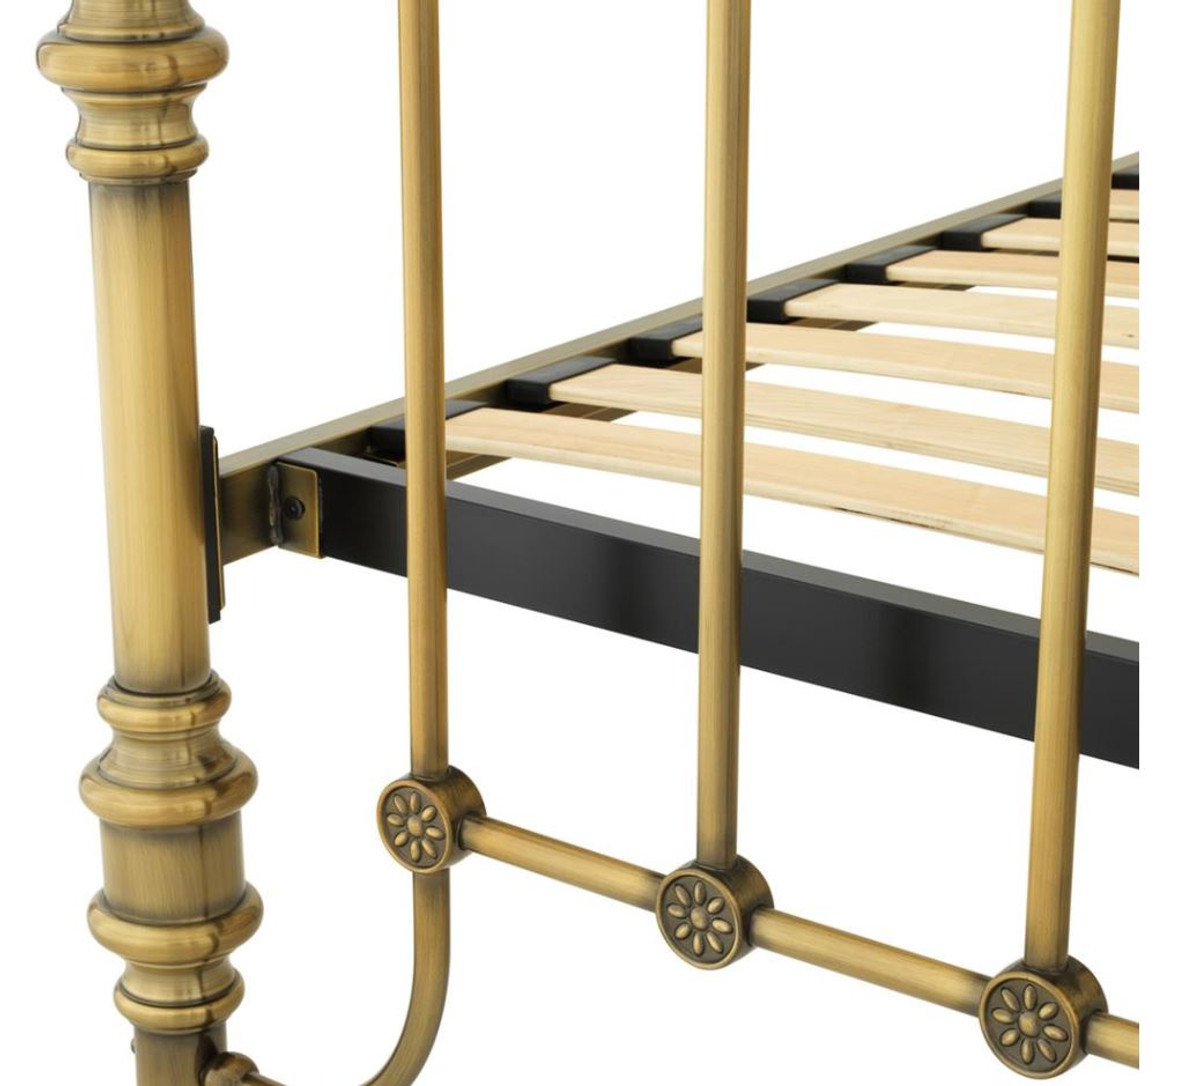 Casa Padrino Luxus Bett Antik Messing 187 x 225,5 x H. 152,5 cm - Designer Möbel 3